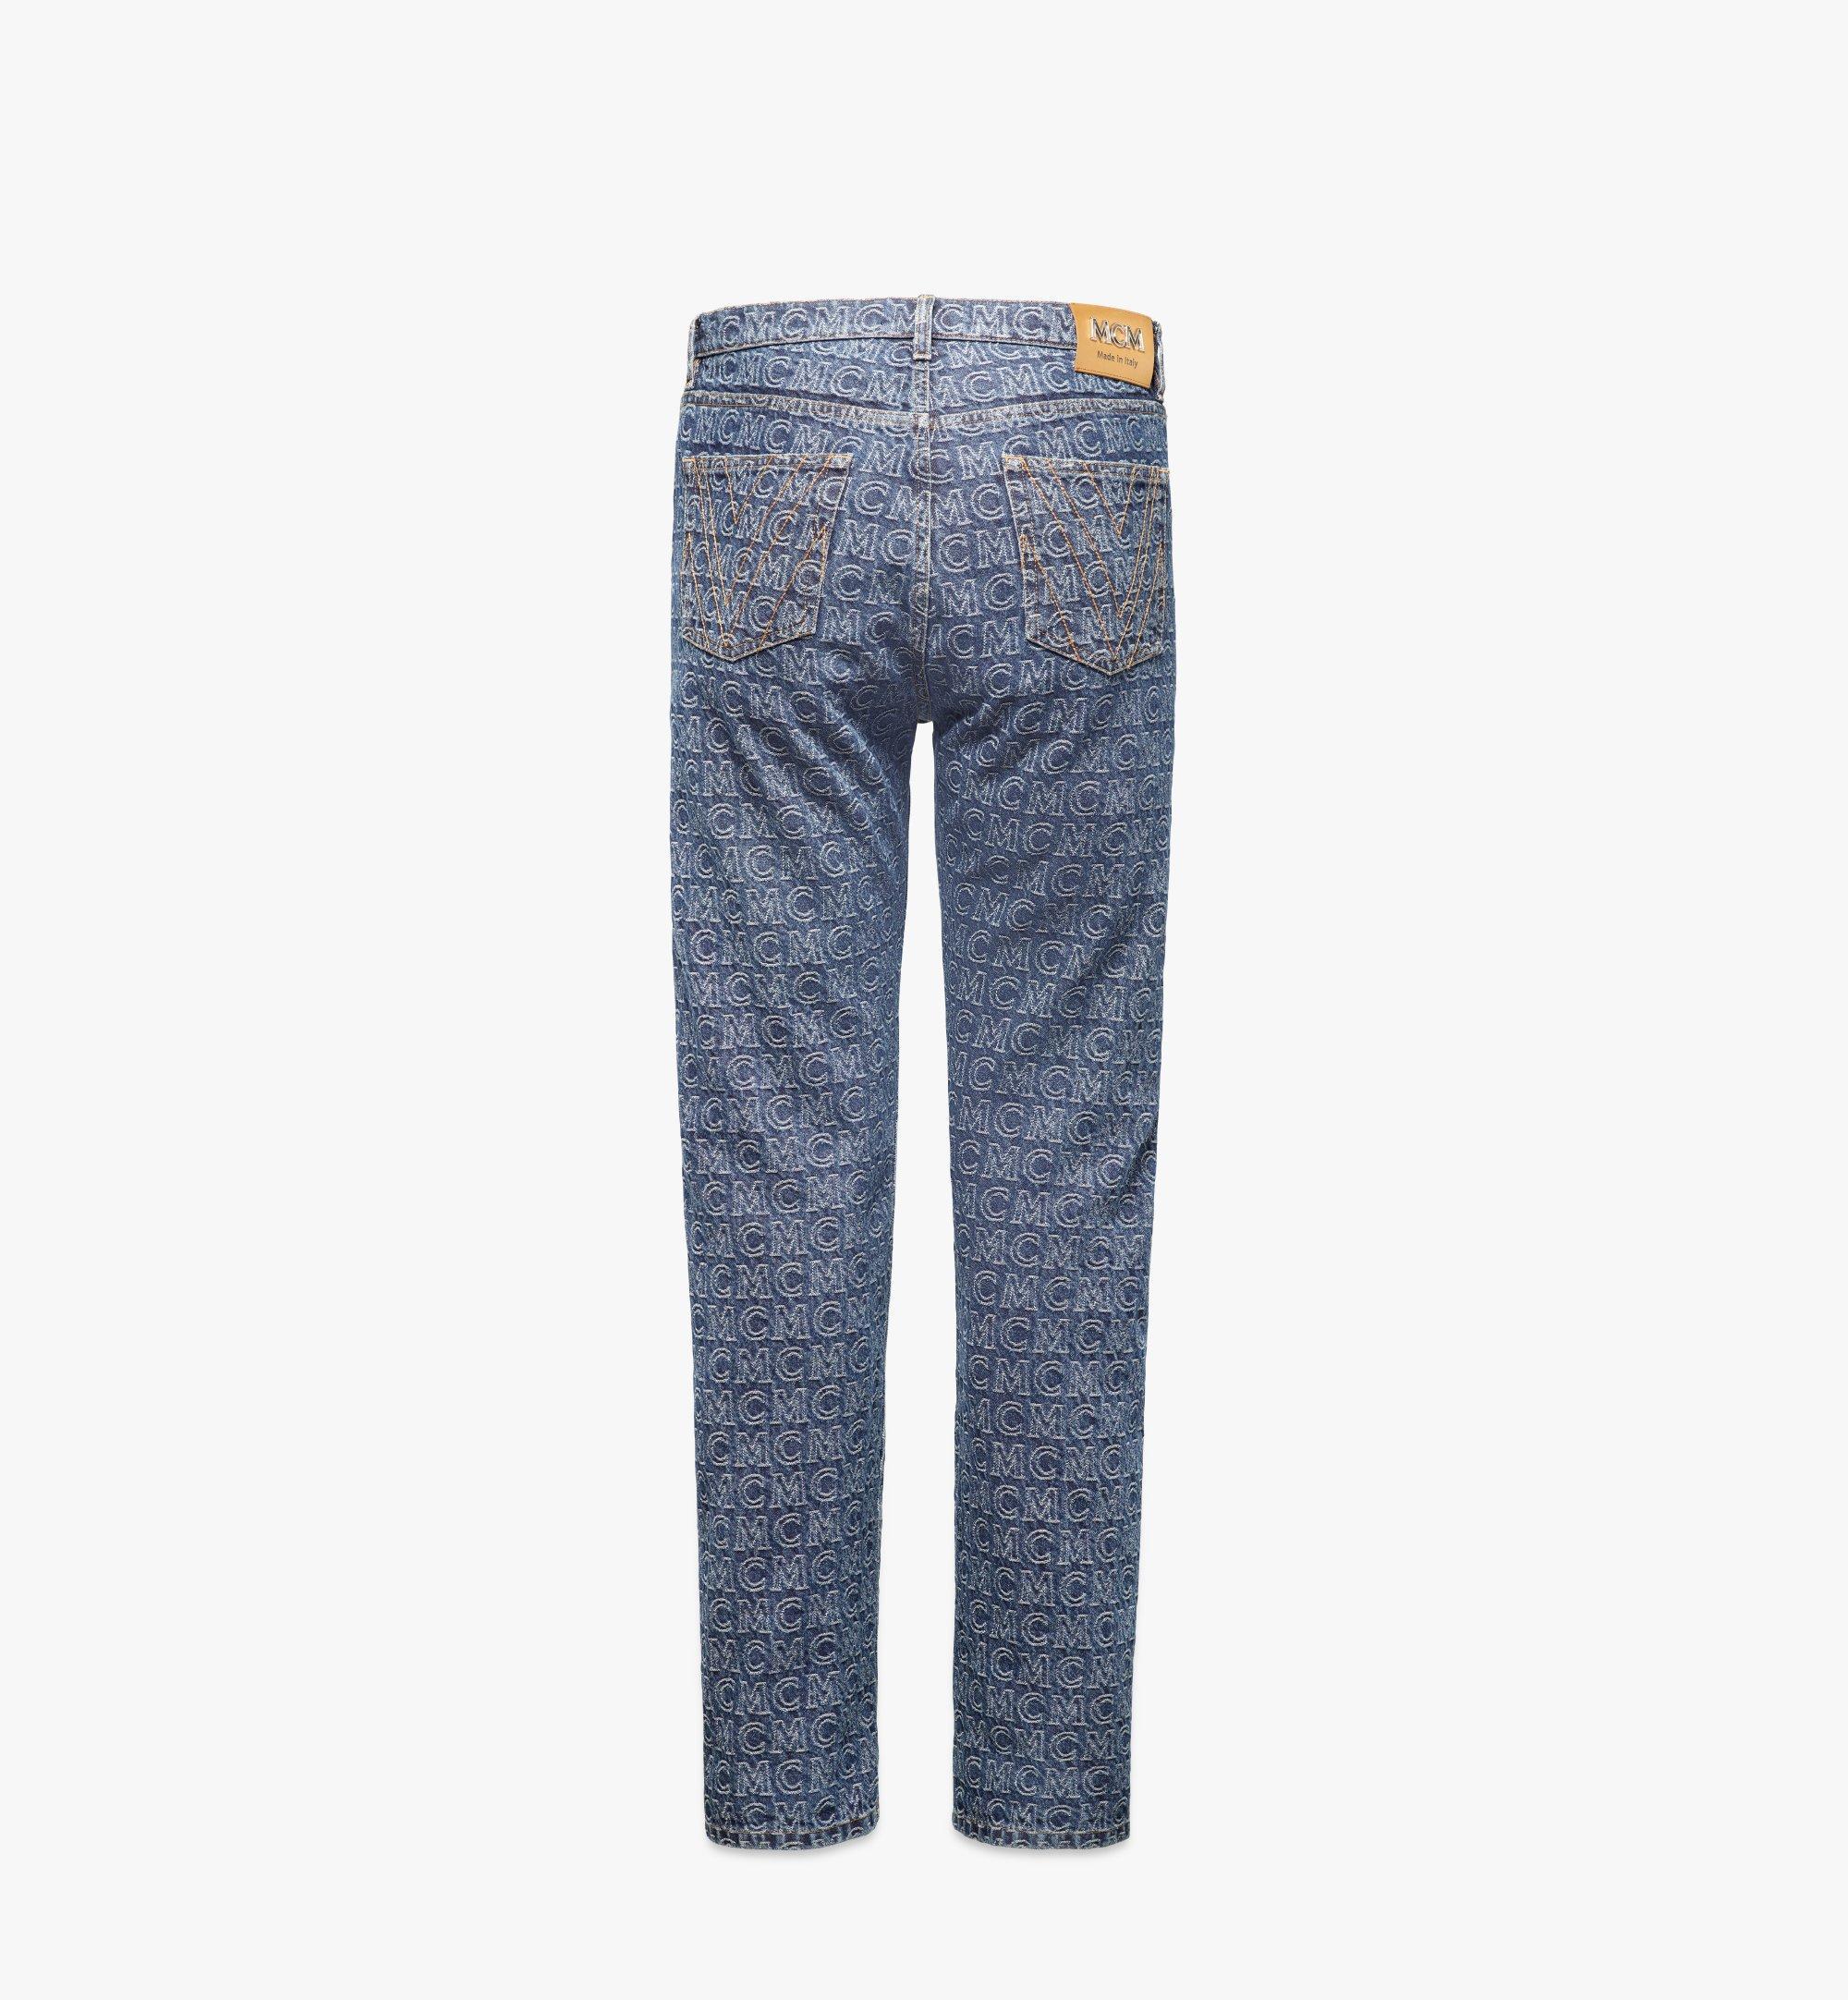 MCM Men's Monogram Straight Leg Jeans Black MHPAADS01VW050 Alternate View 1